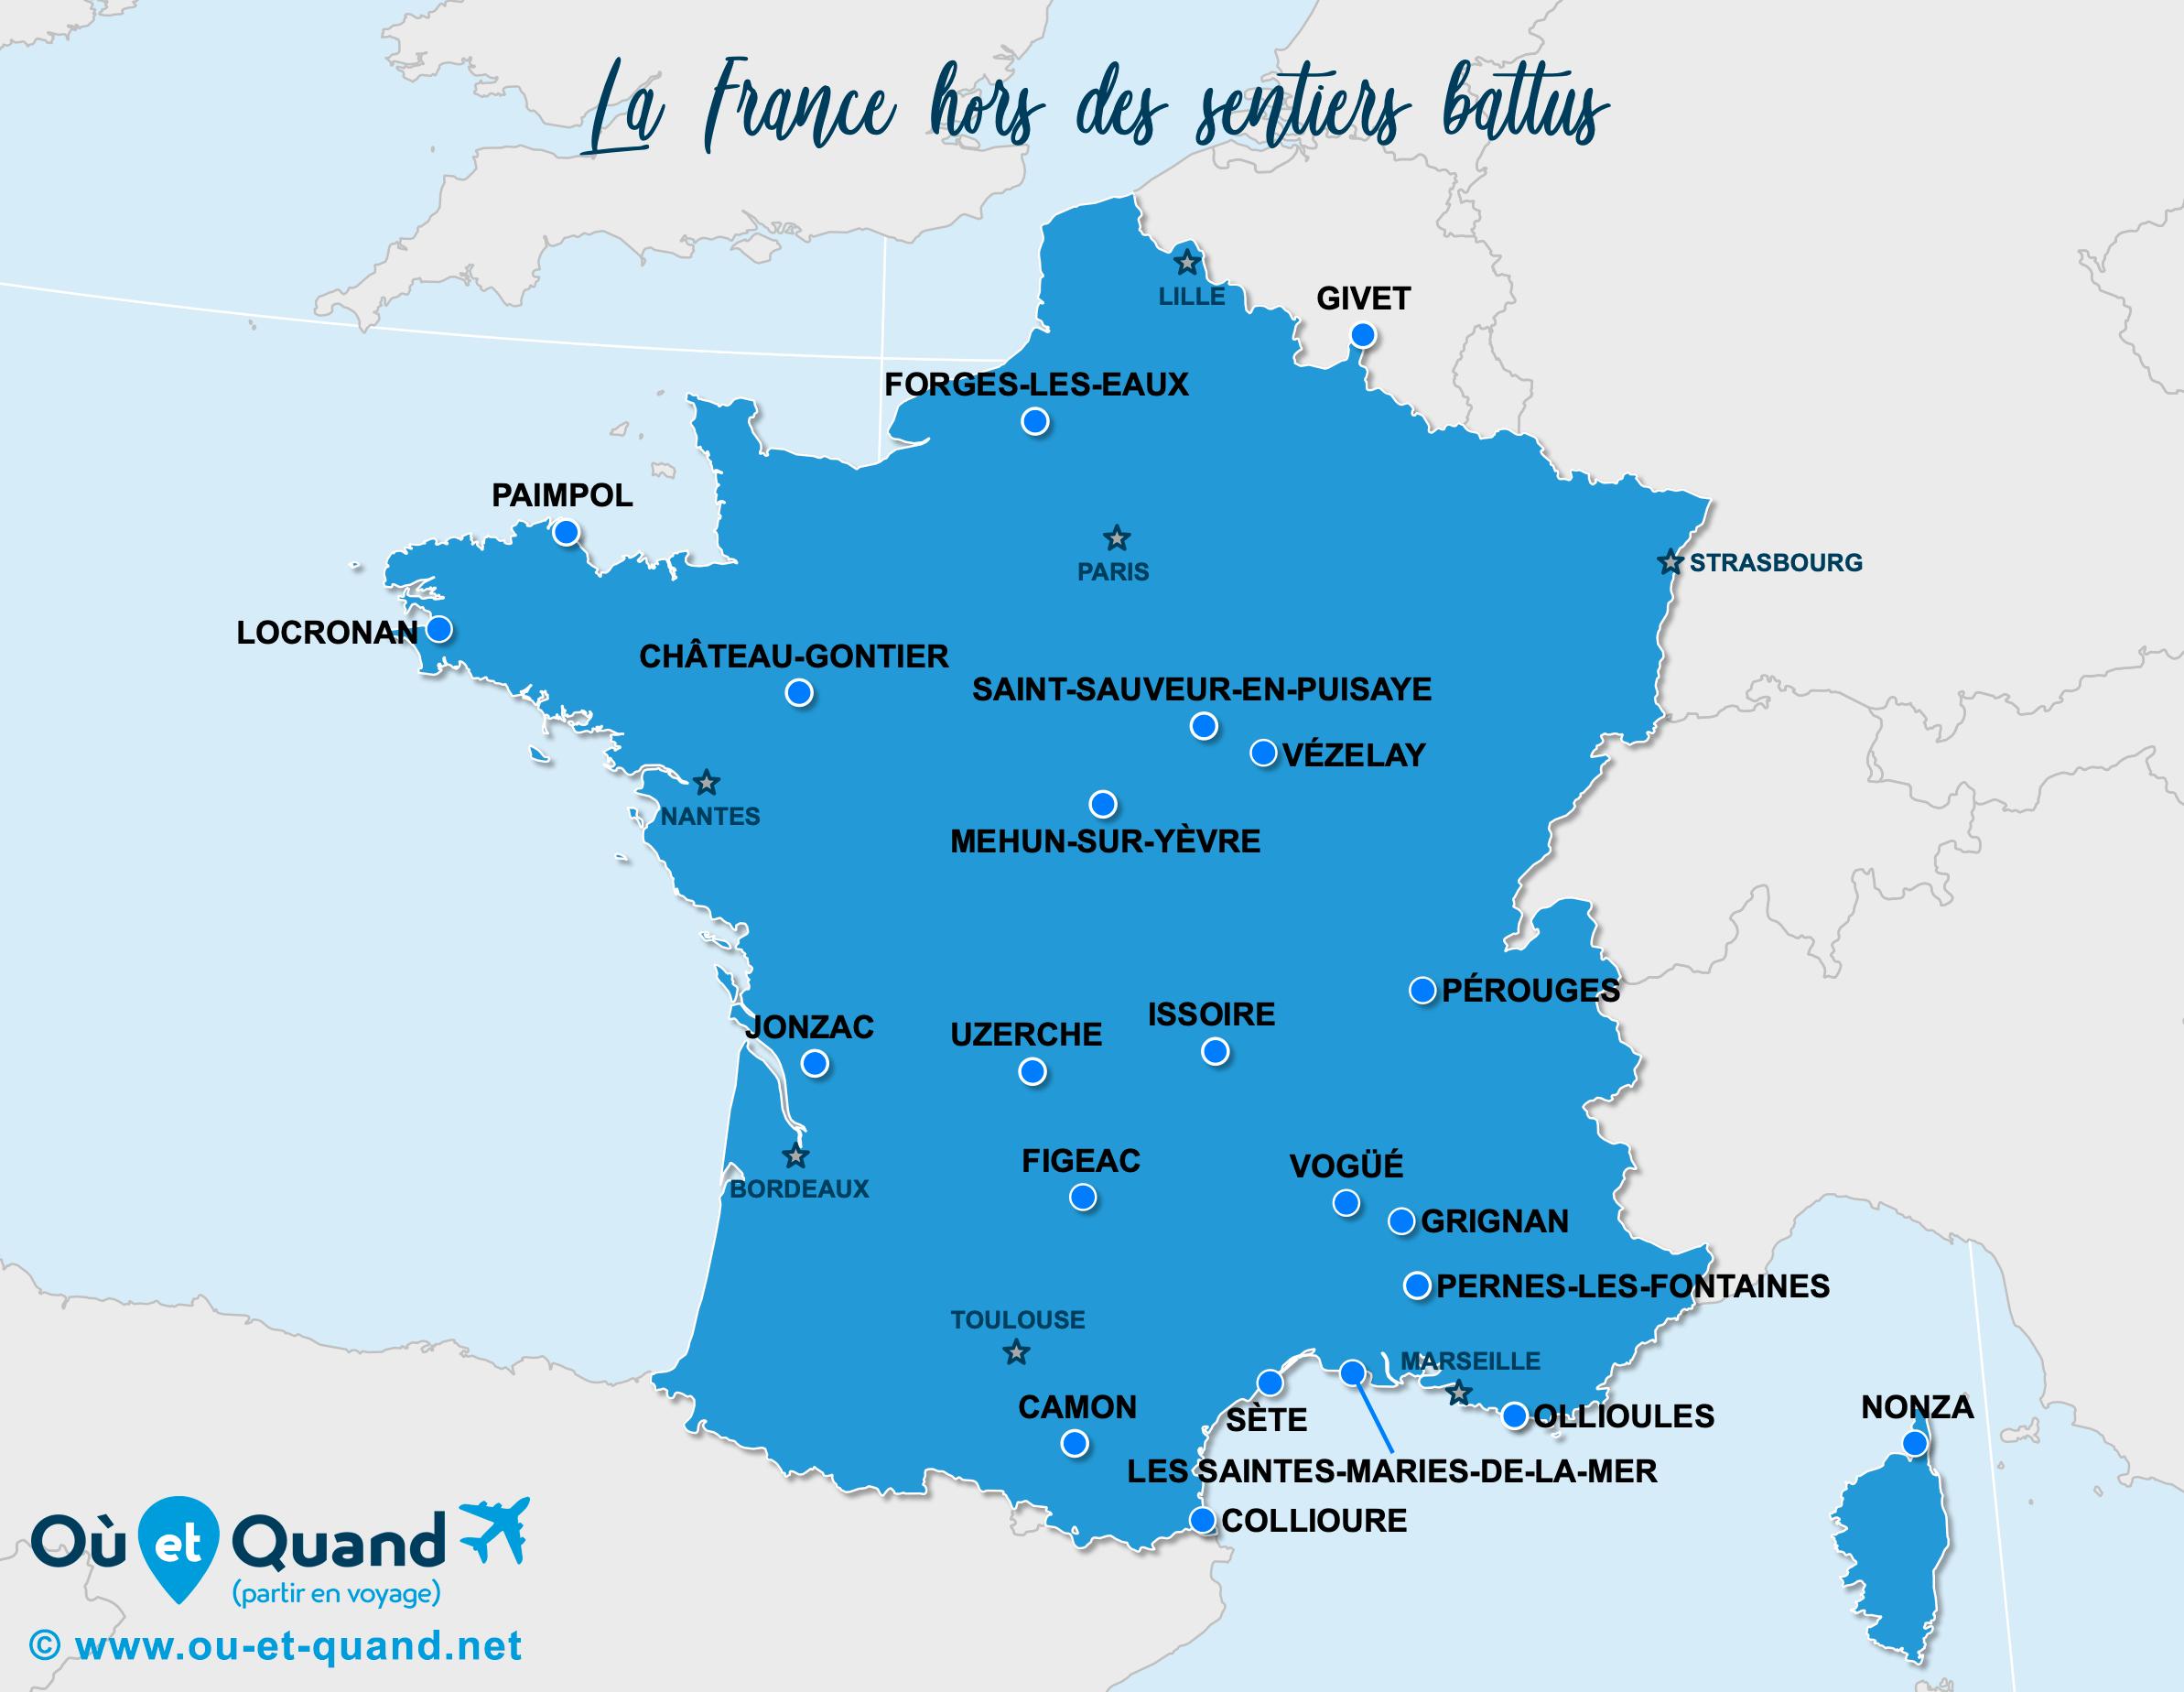 Carte France : La France hors des sentiers battus